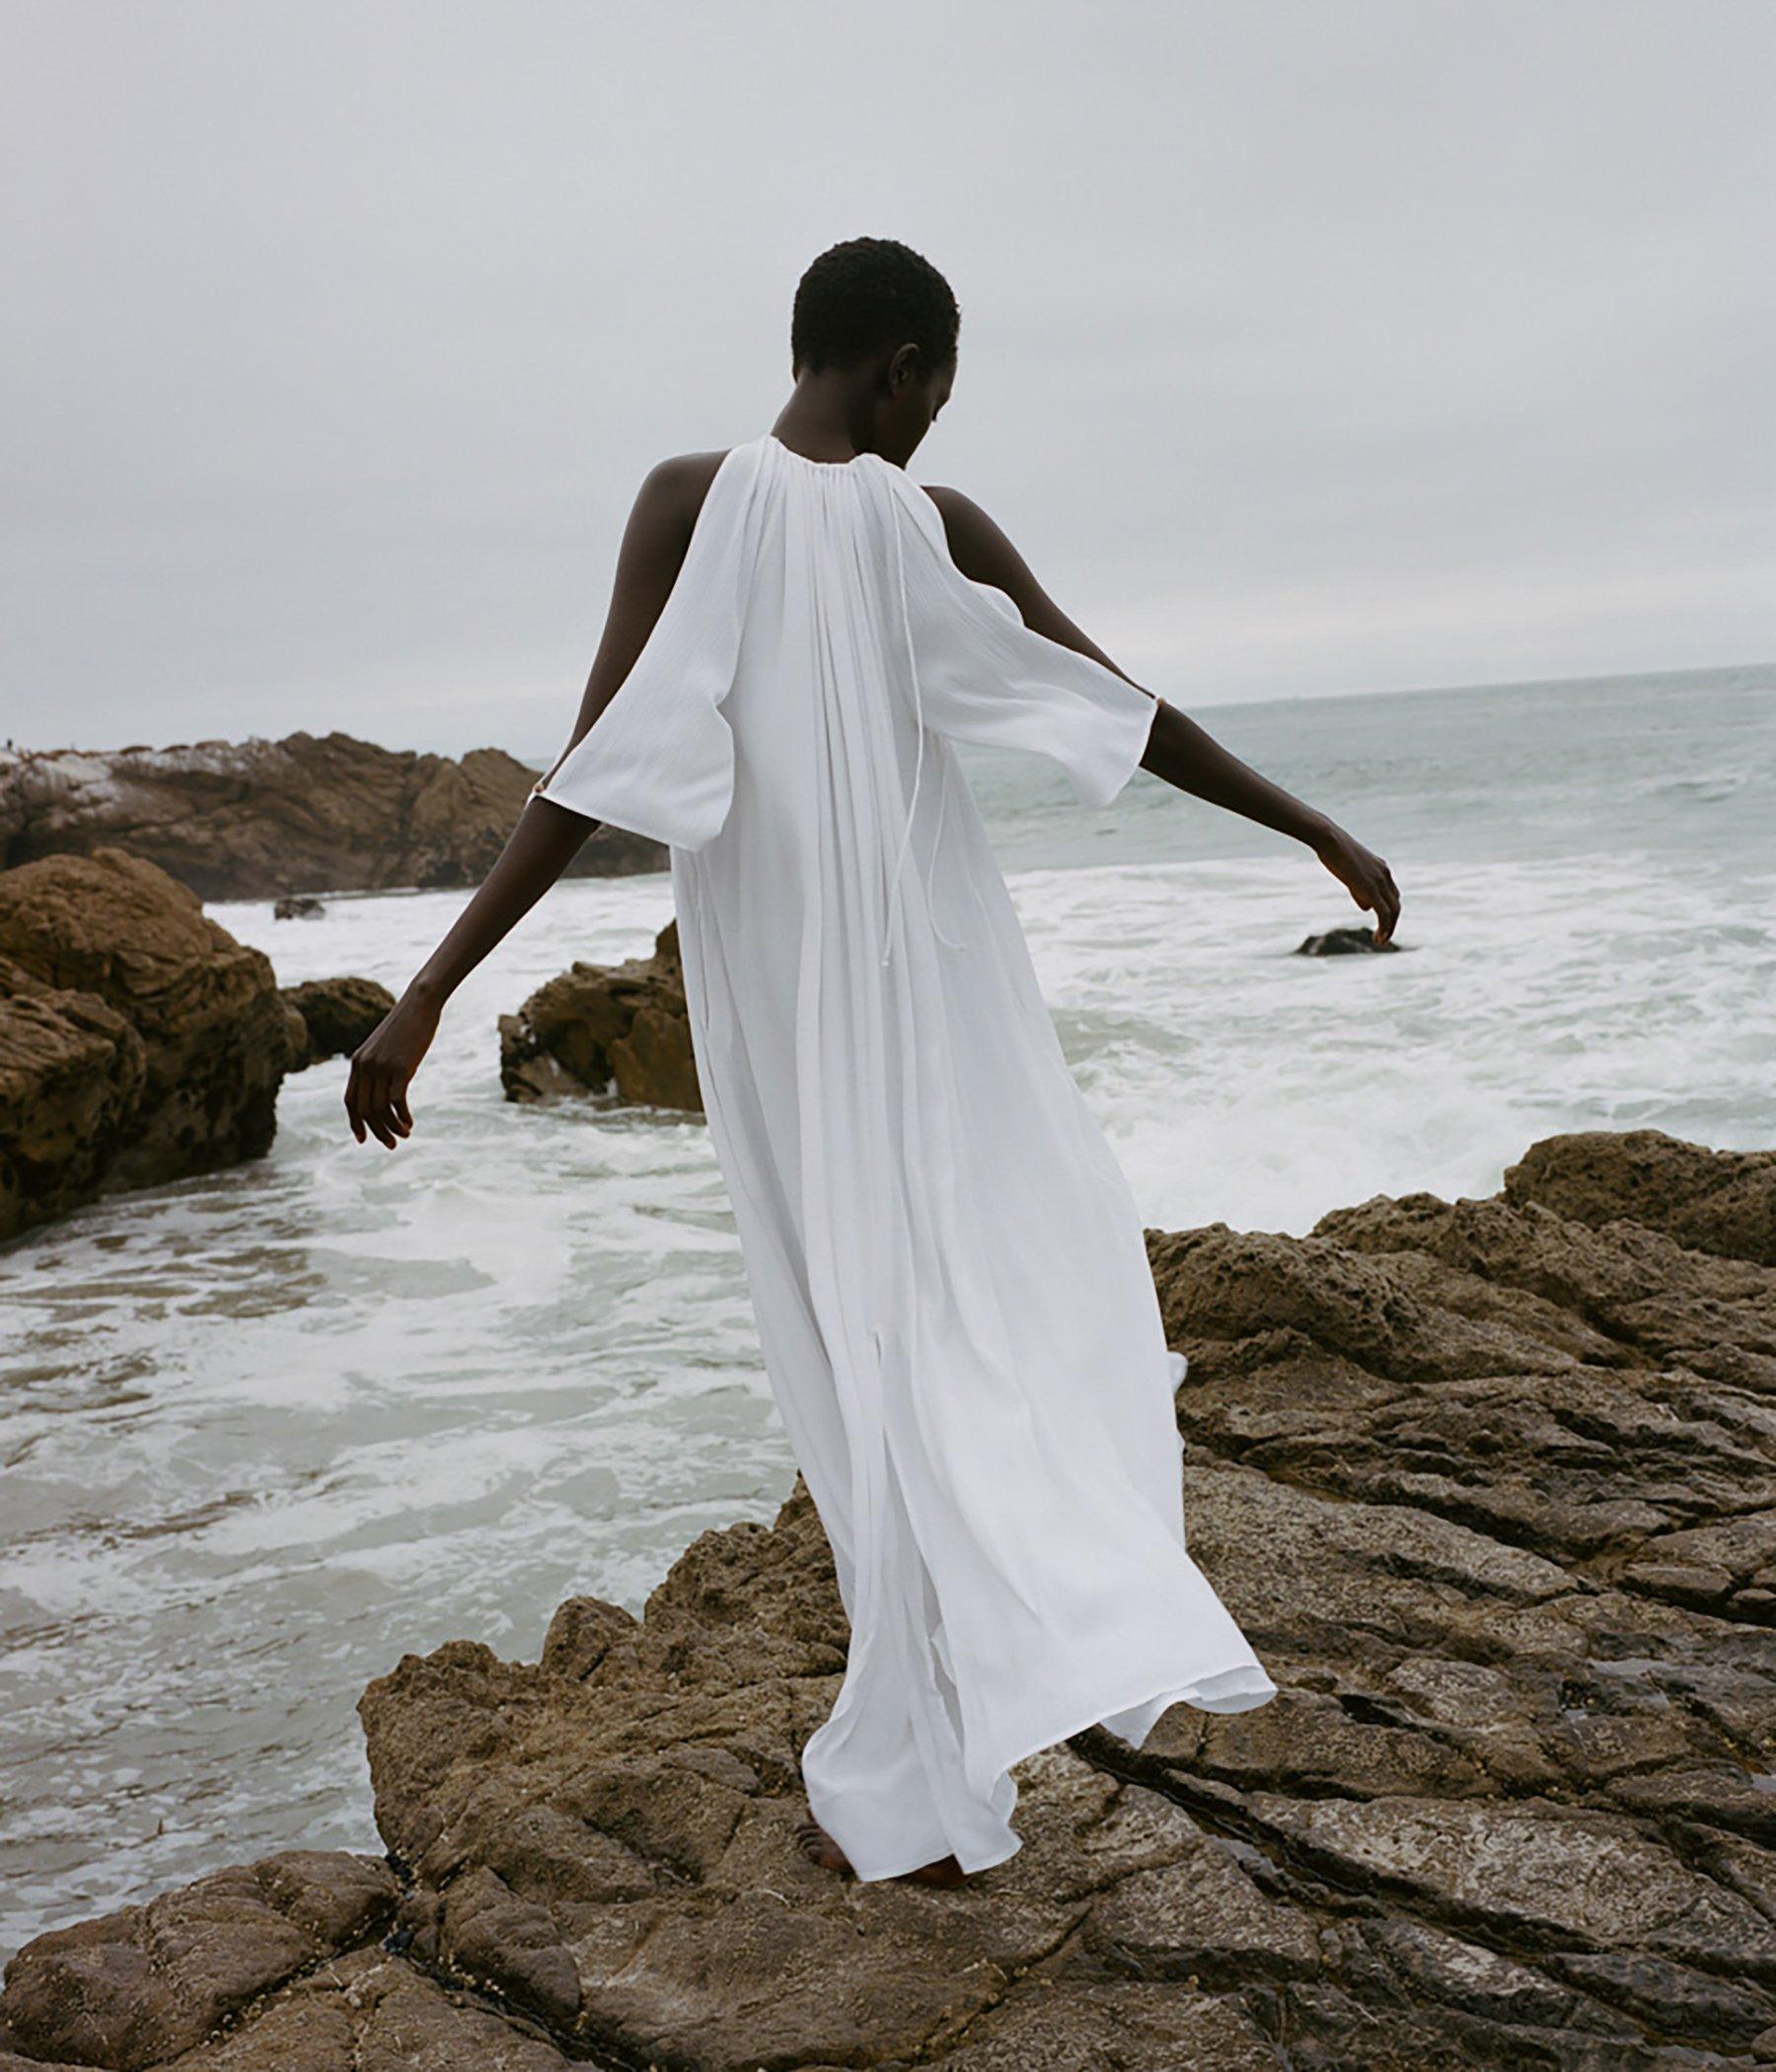 iGNANT-Photography-John-Clayton-Lee-Selection-001